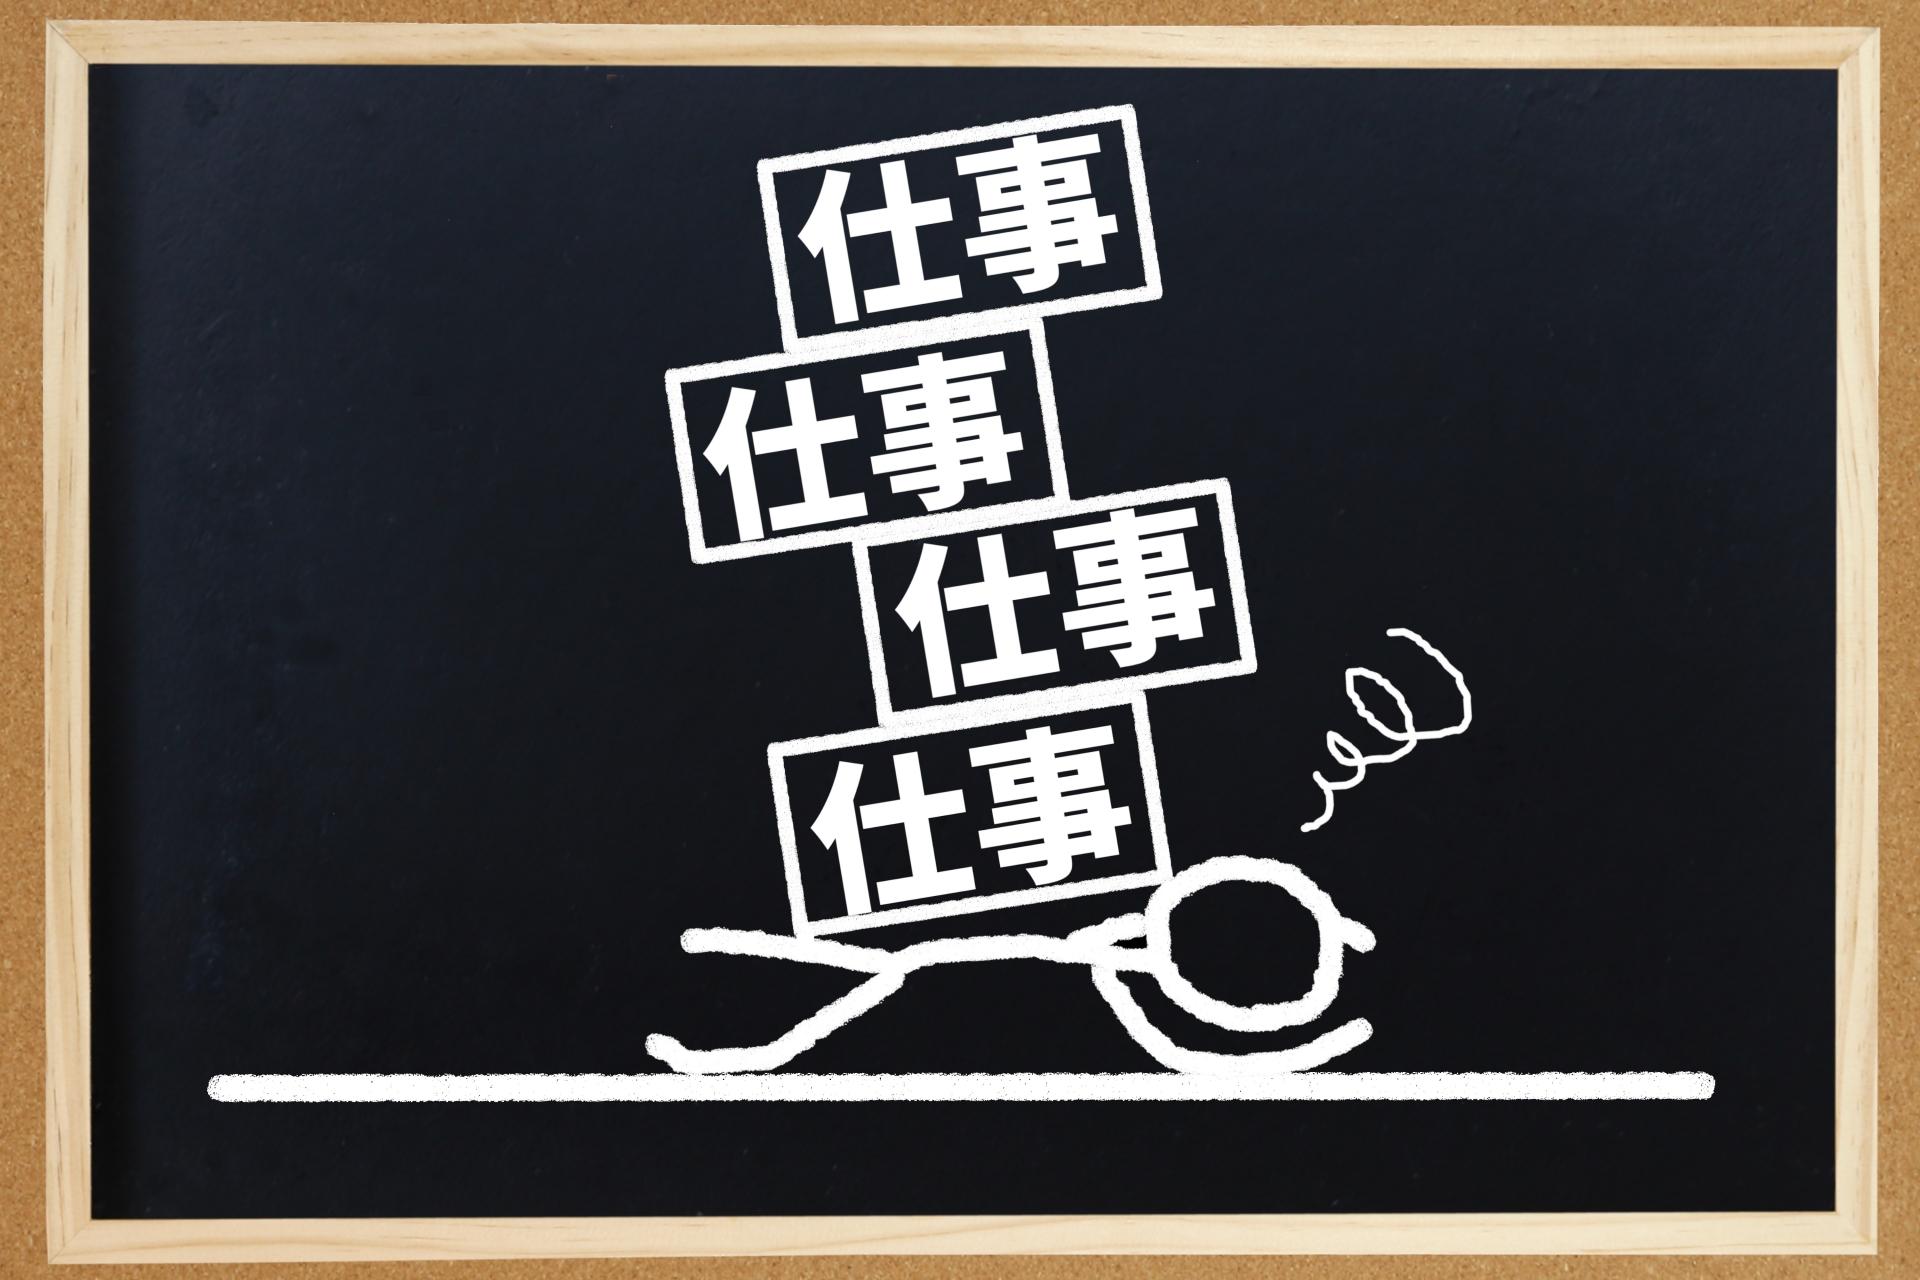 医師人生 時間外労働 新潟市民病院 女性研修医 自殺 過労死 過重労働 家老 精神的苦痛 労災申請 労働基準法 労務管理 若手医師 選択肢 医師転職相談 医師キャリア相談 医師キャリアプラン 医師紹介会社 医師転職エージェント ジーネット株式会社